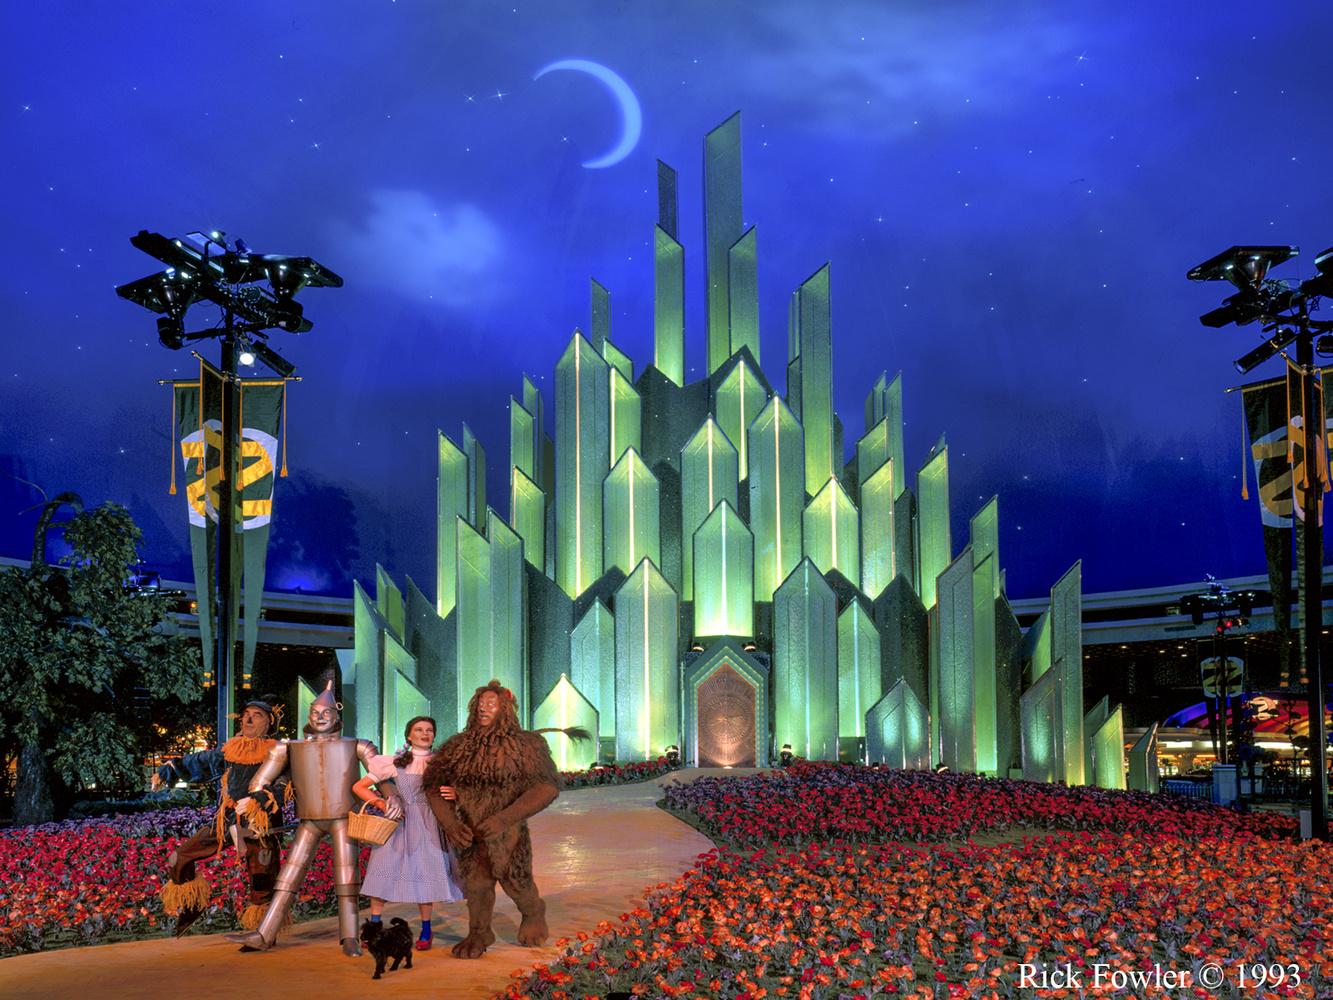 MGM Grand hotel OZ Theme by Rick Fowler